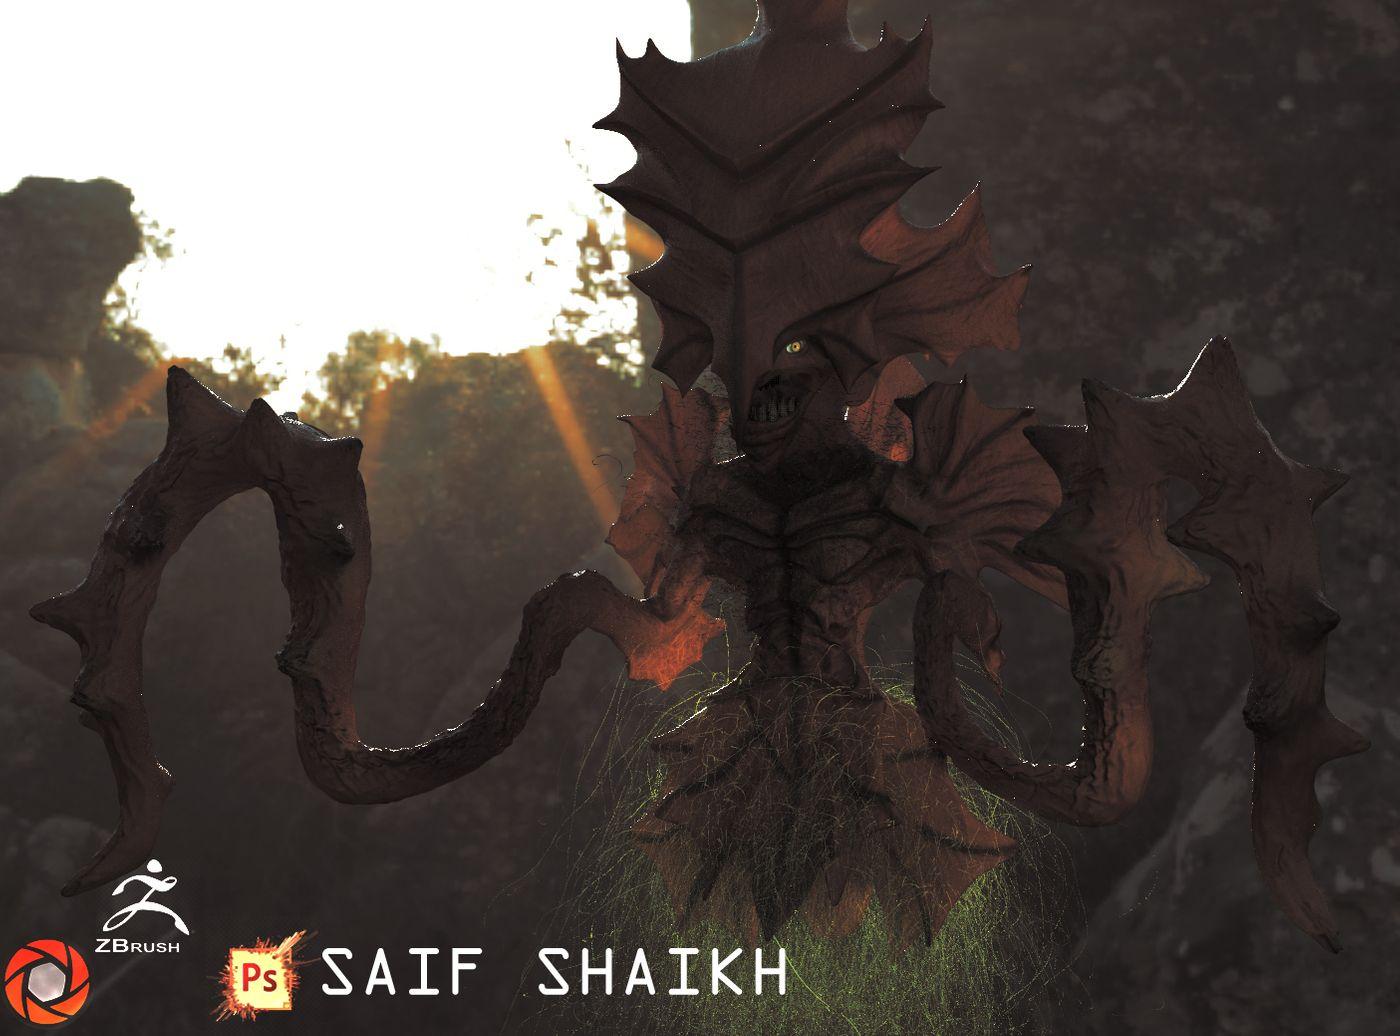 Spirit%20of%20forest Shaikh799ss.7.1